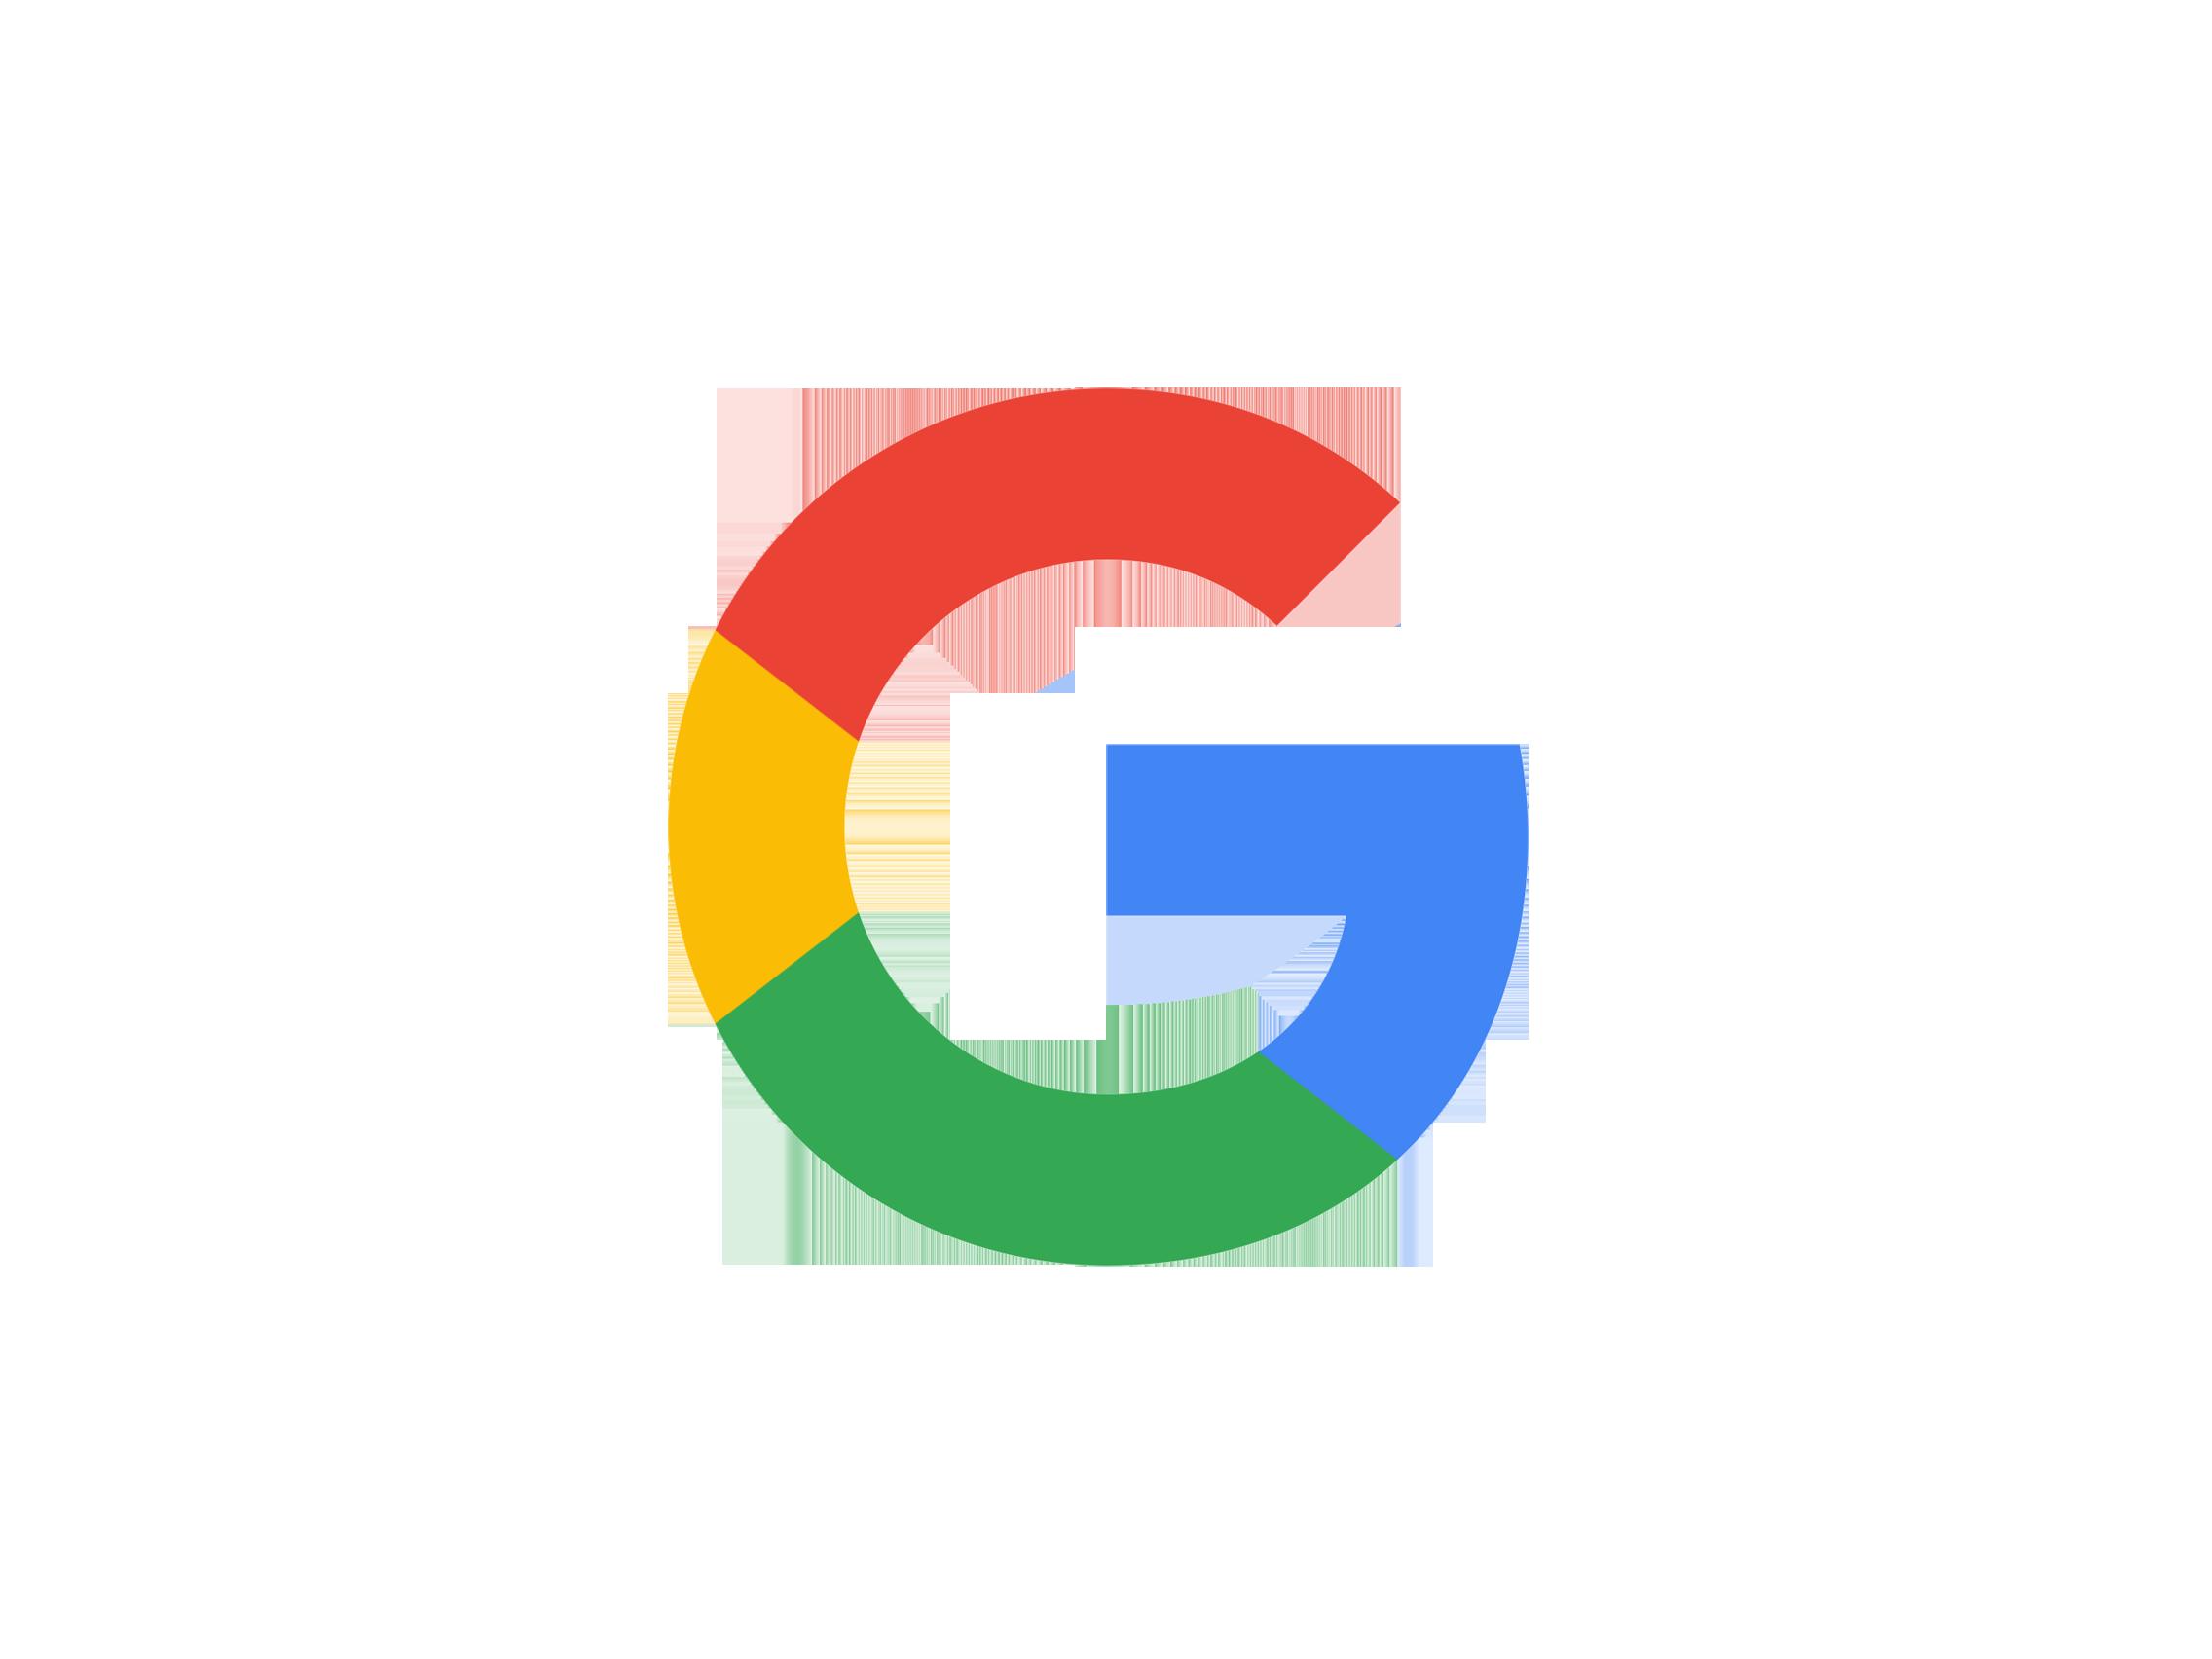 Google-logo-2015-G-icon.png